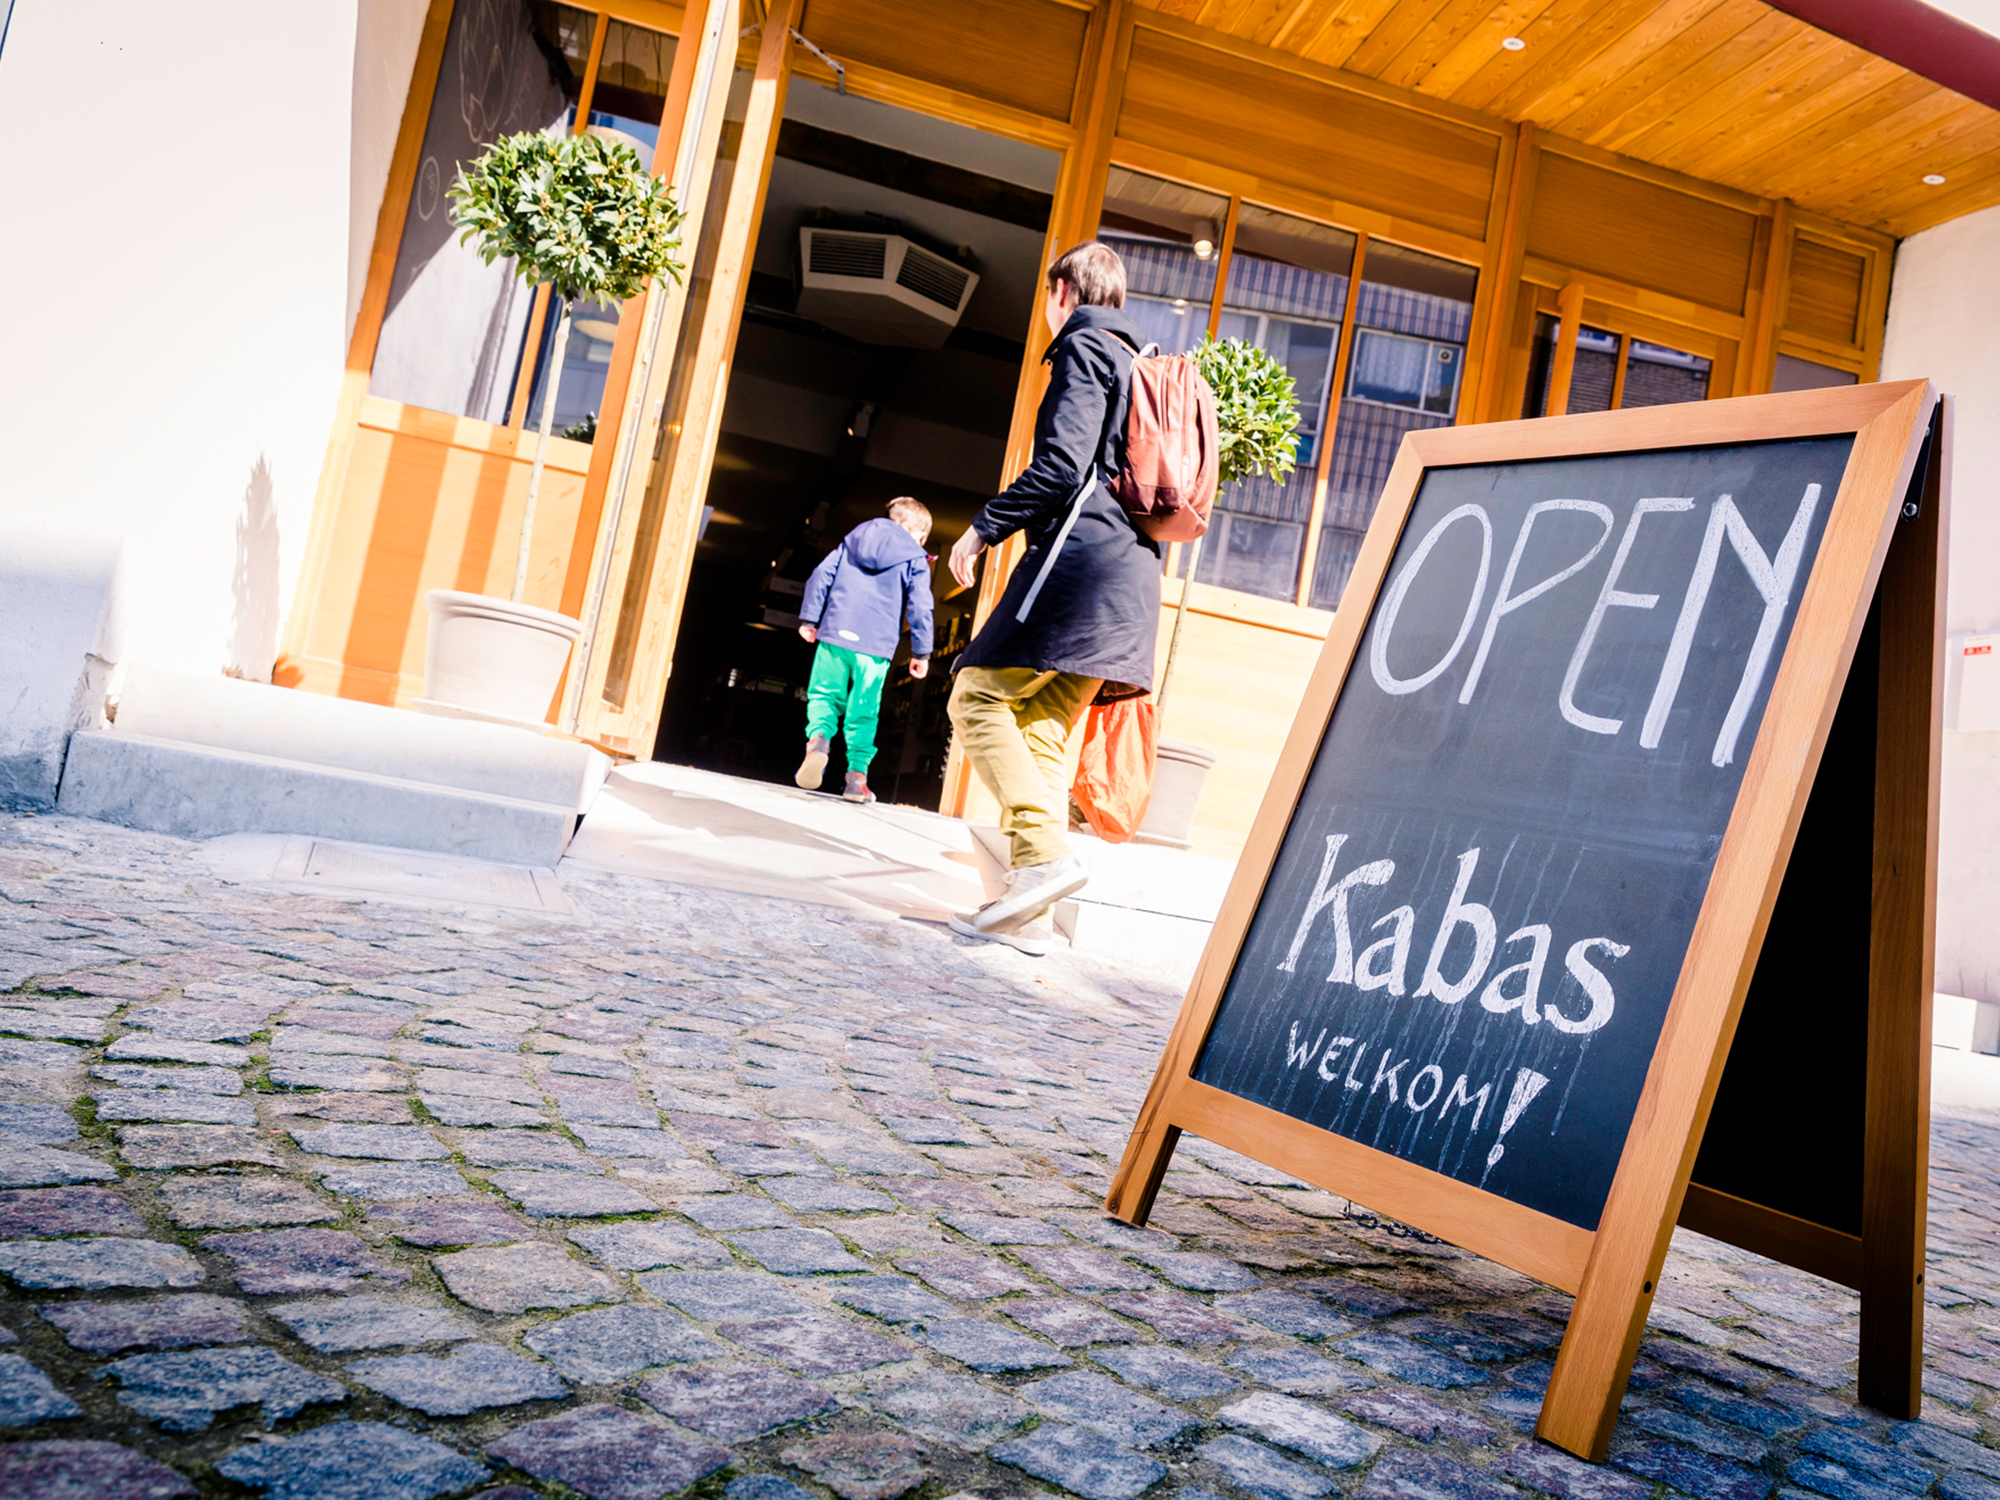 Kabas_Mechelen_bord_open